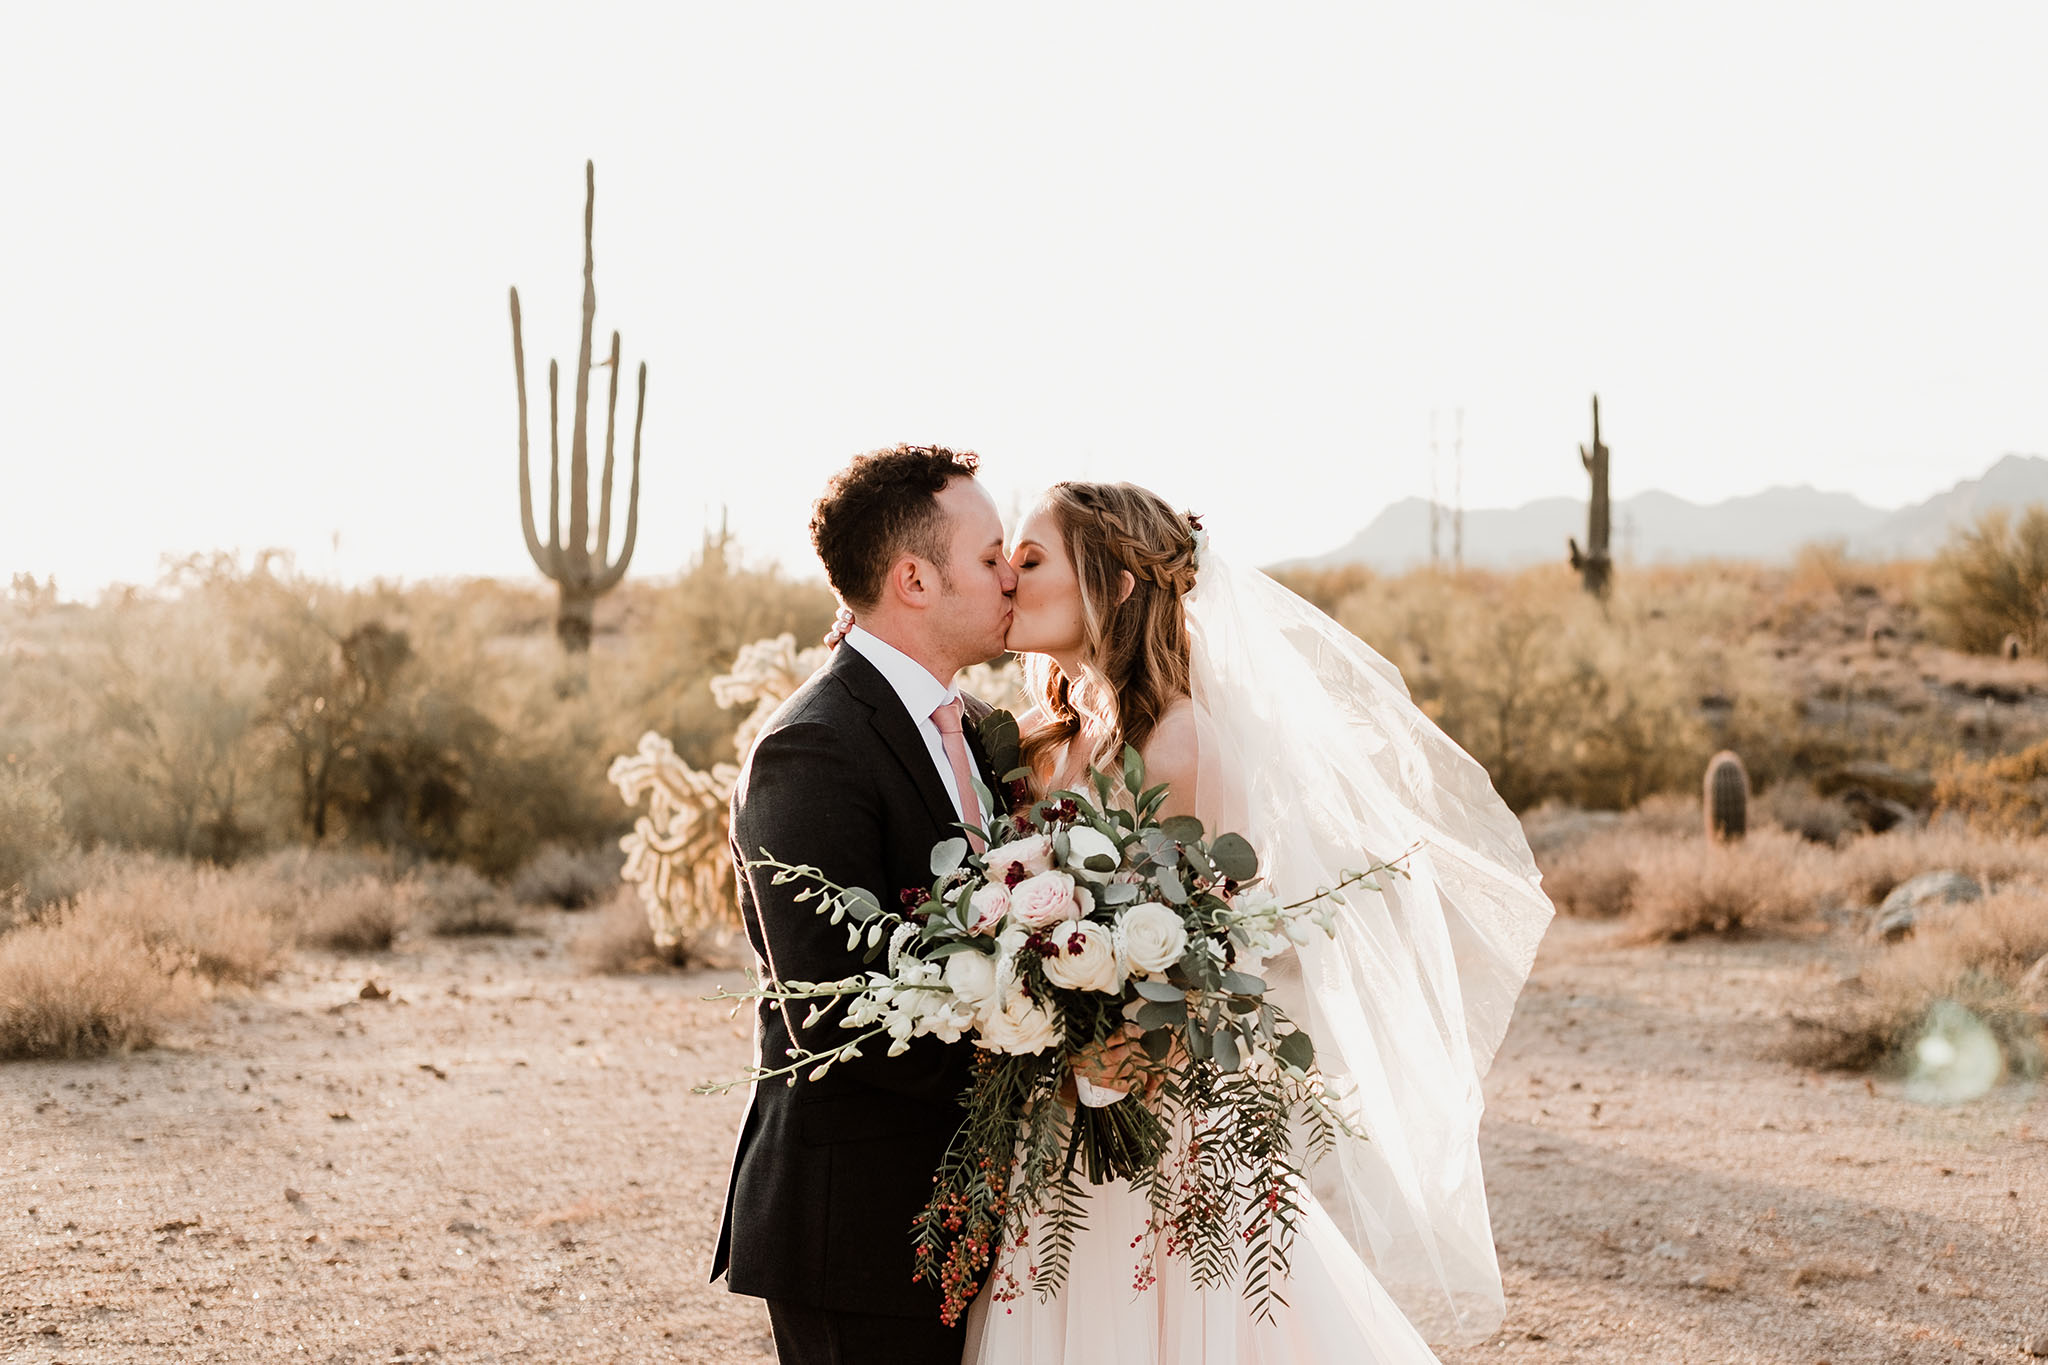 Arizona-Wedding-Photographer-The-Paseo-Venue27.jpg